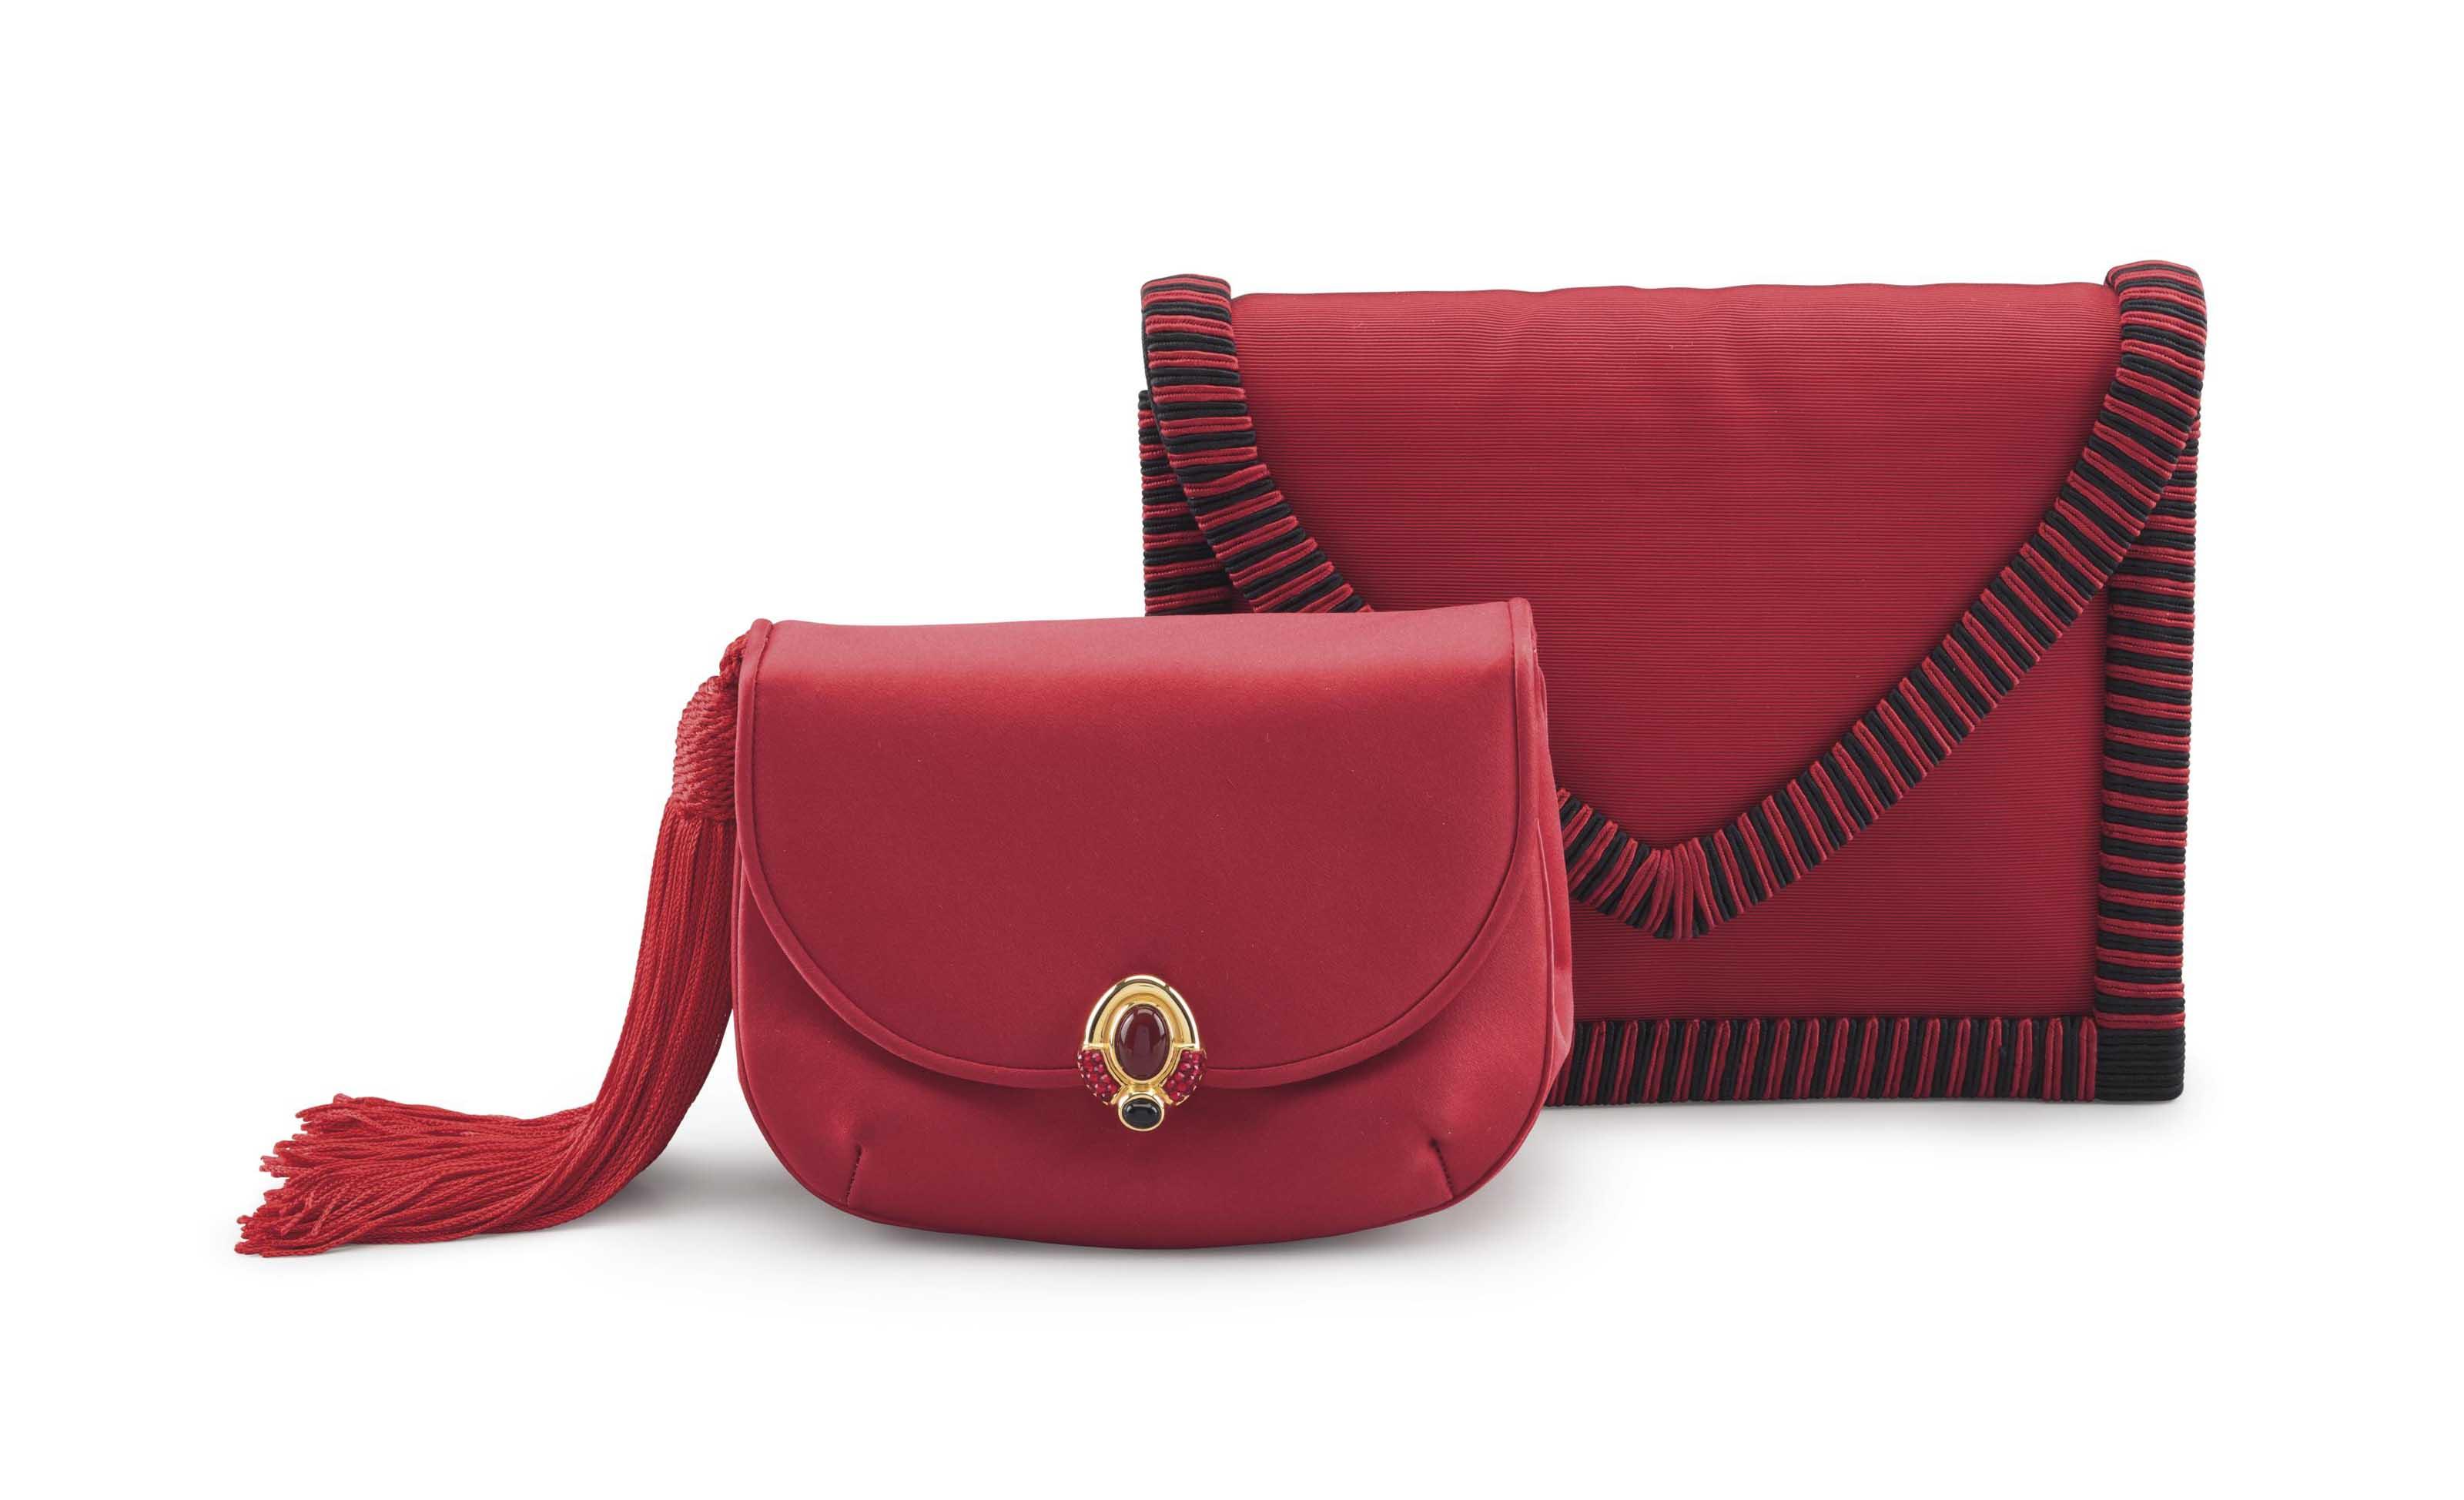 A RED SATIN TASSEL BOROSO CLUTCH BAG WITH CABOCHON And A RED U0026 BLACK GROSGRAIN ENVELOPE CLUTCH ...